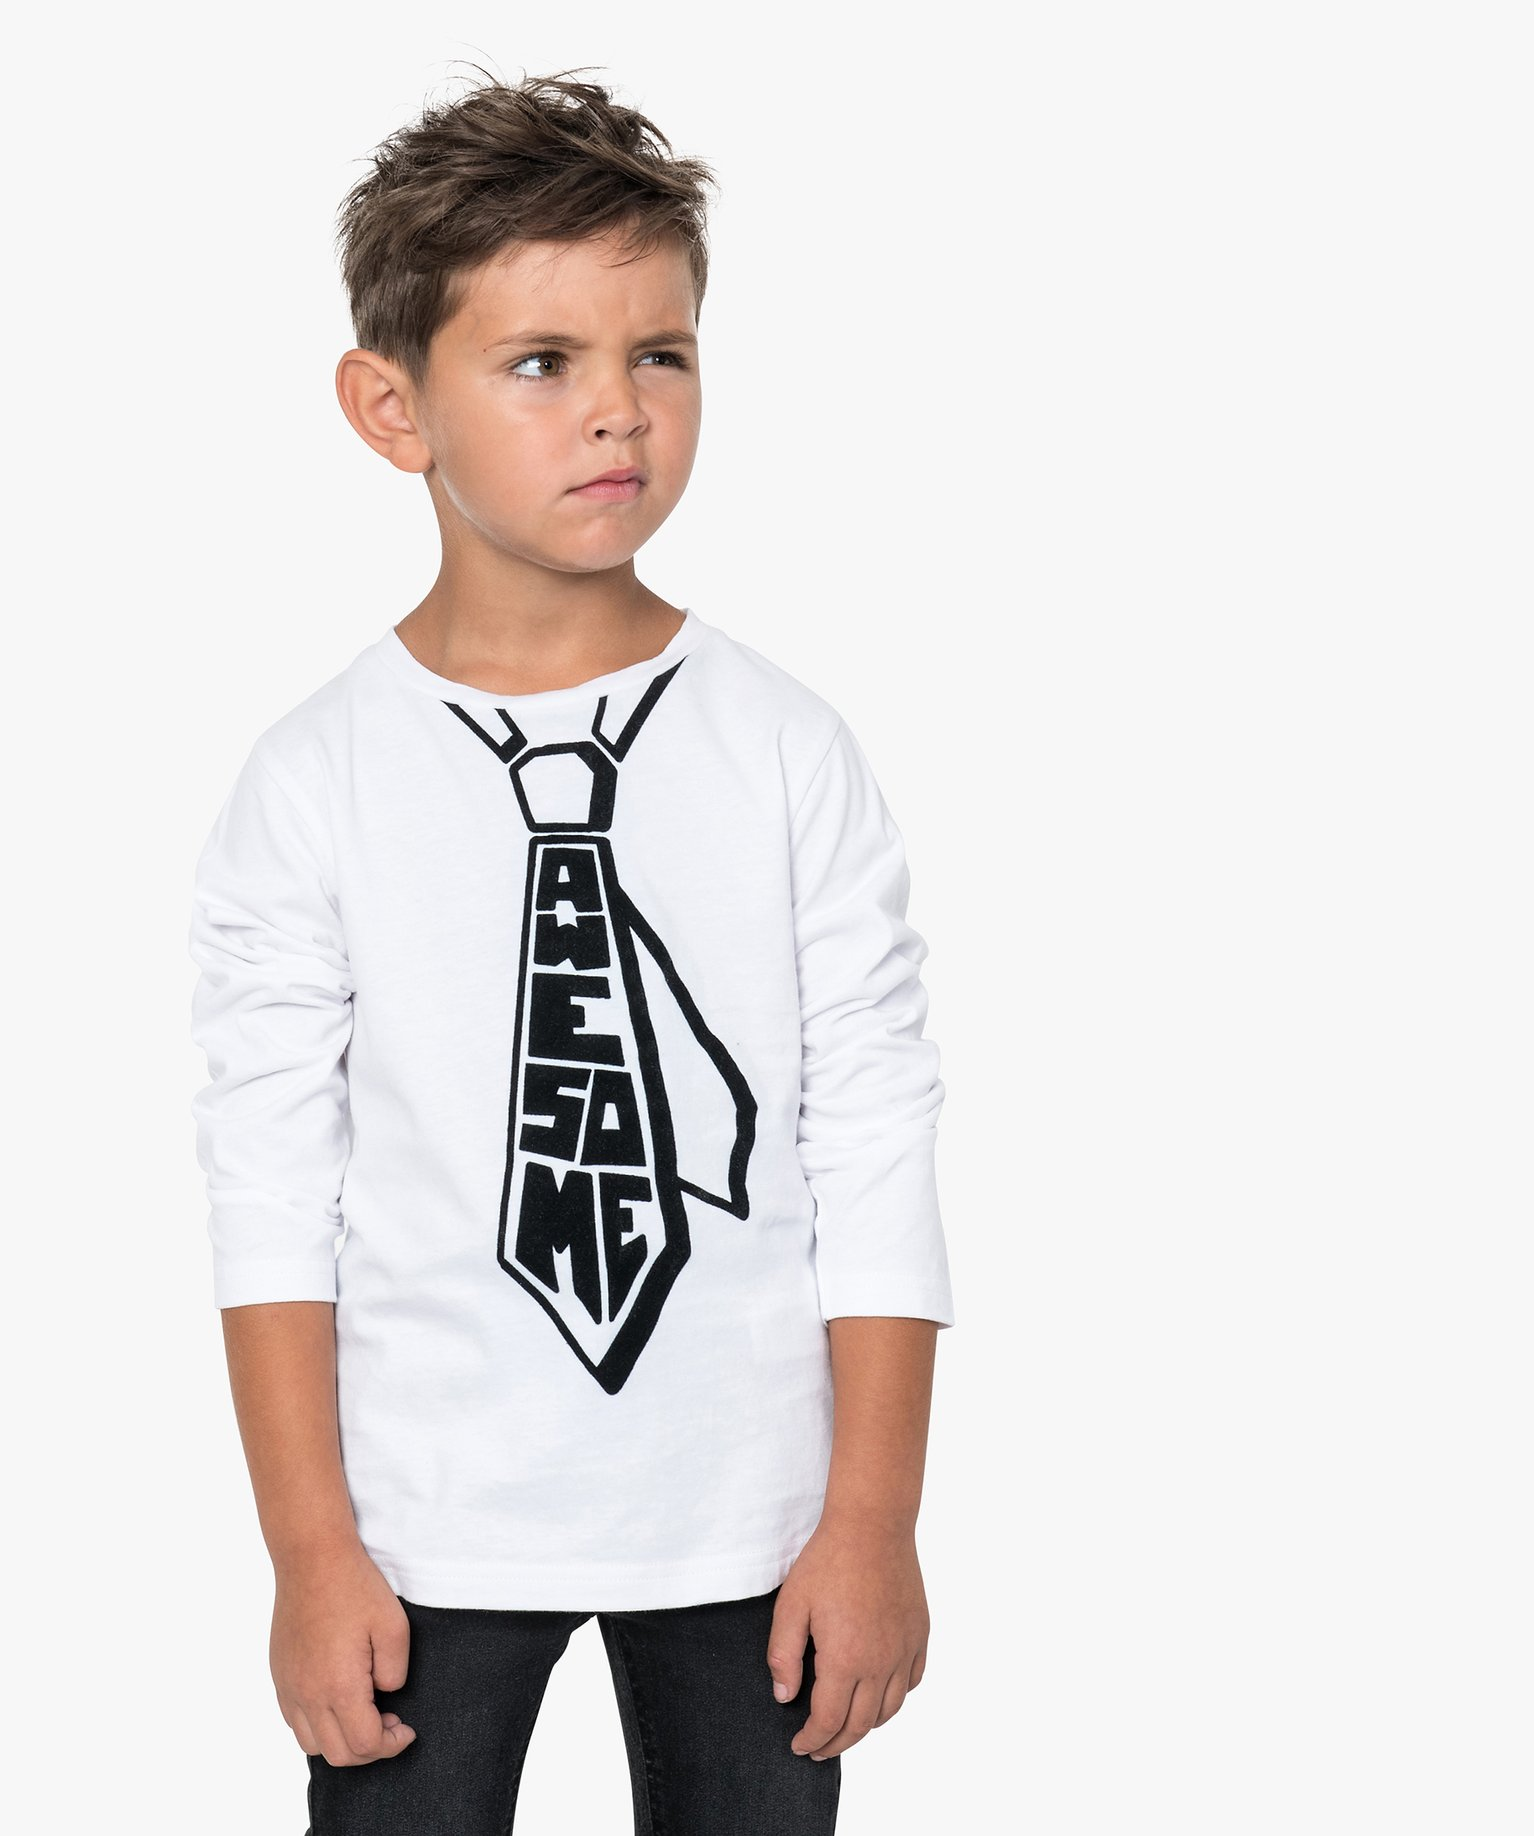 Tee-shirt garçon avec cravate imprimée